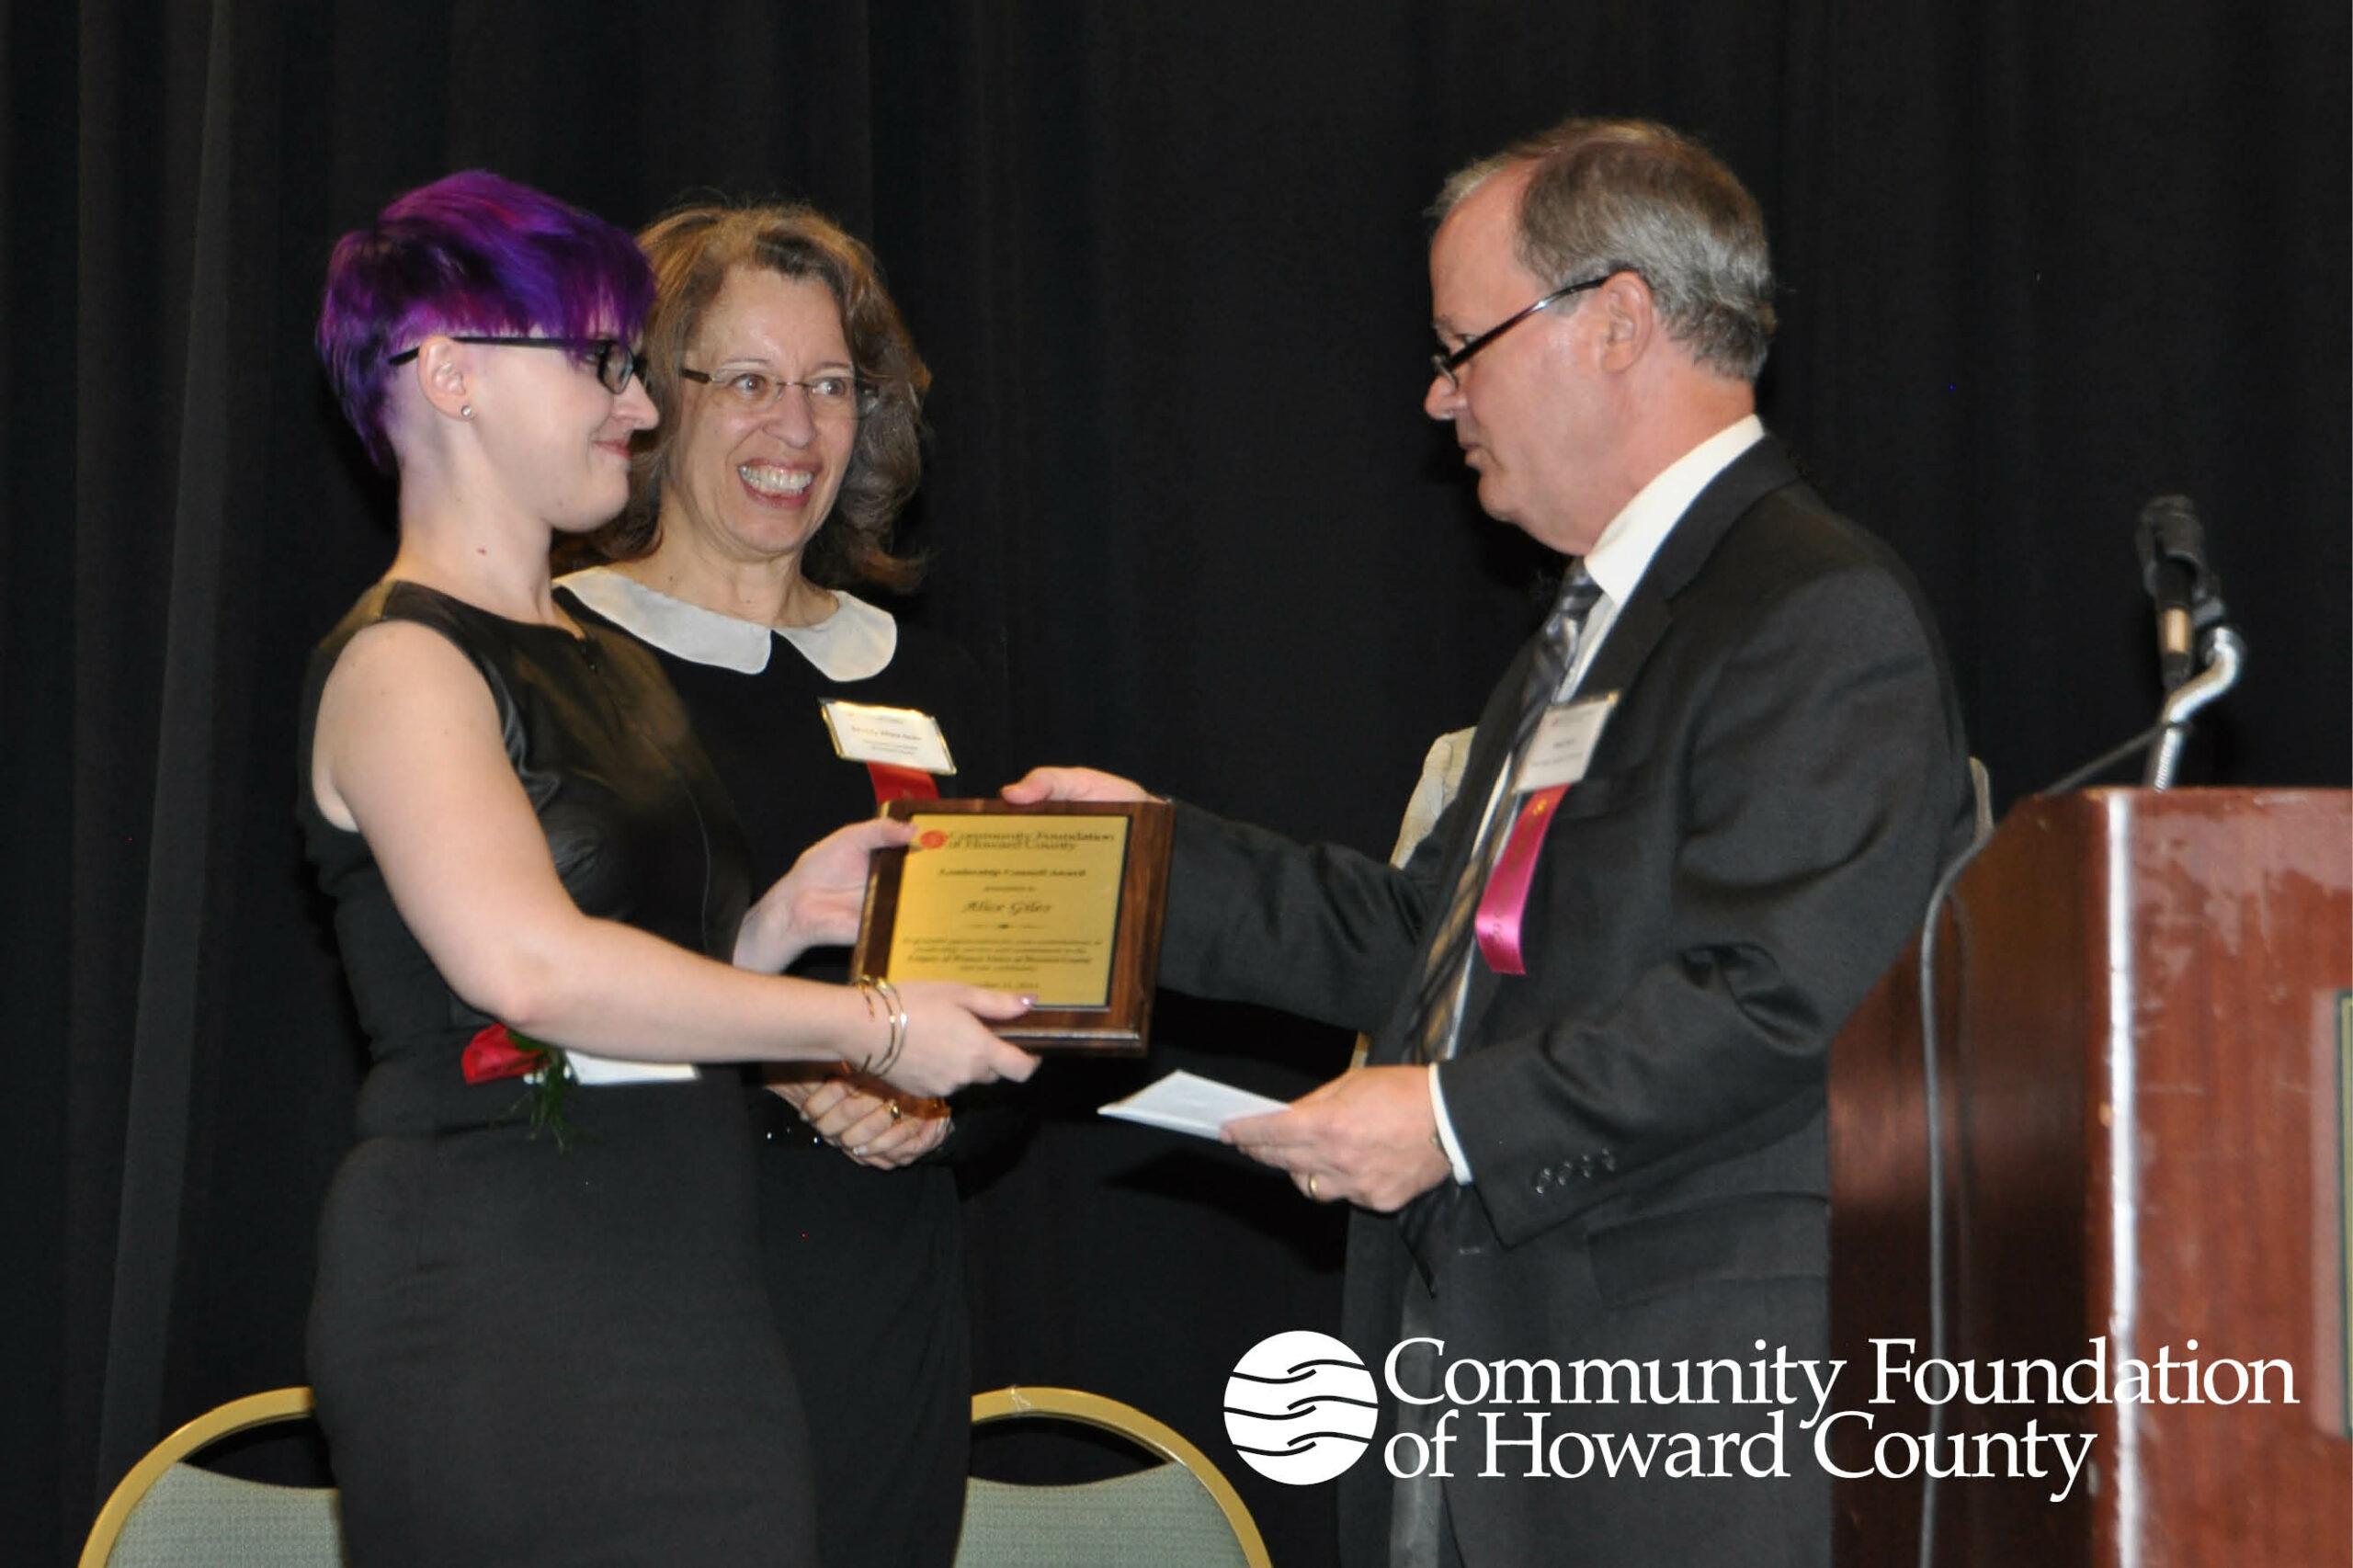 Leadership Council Award